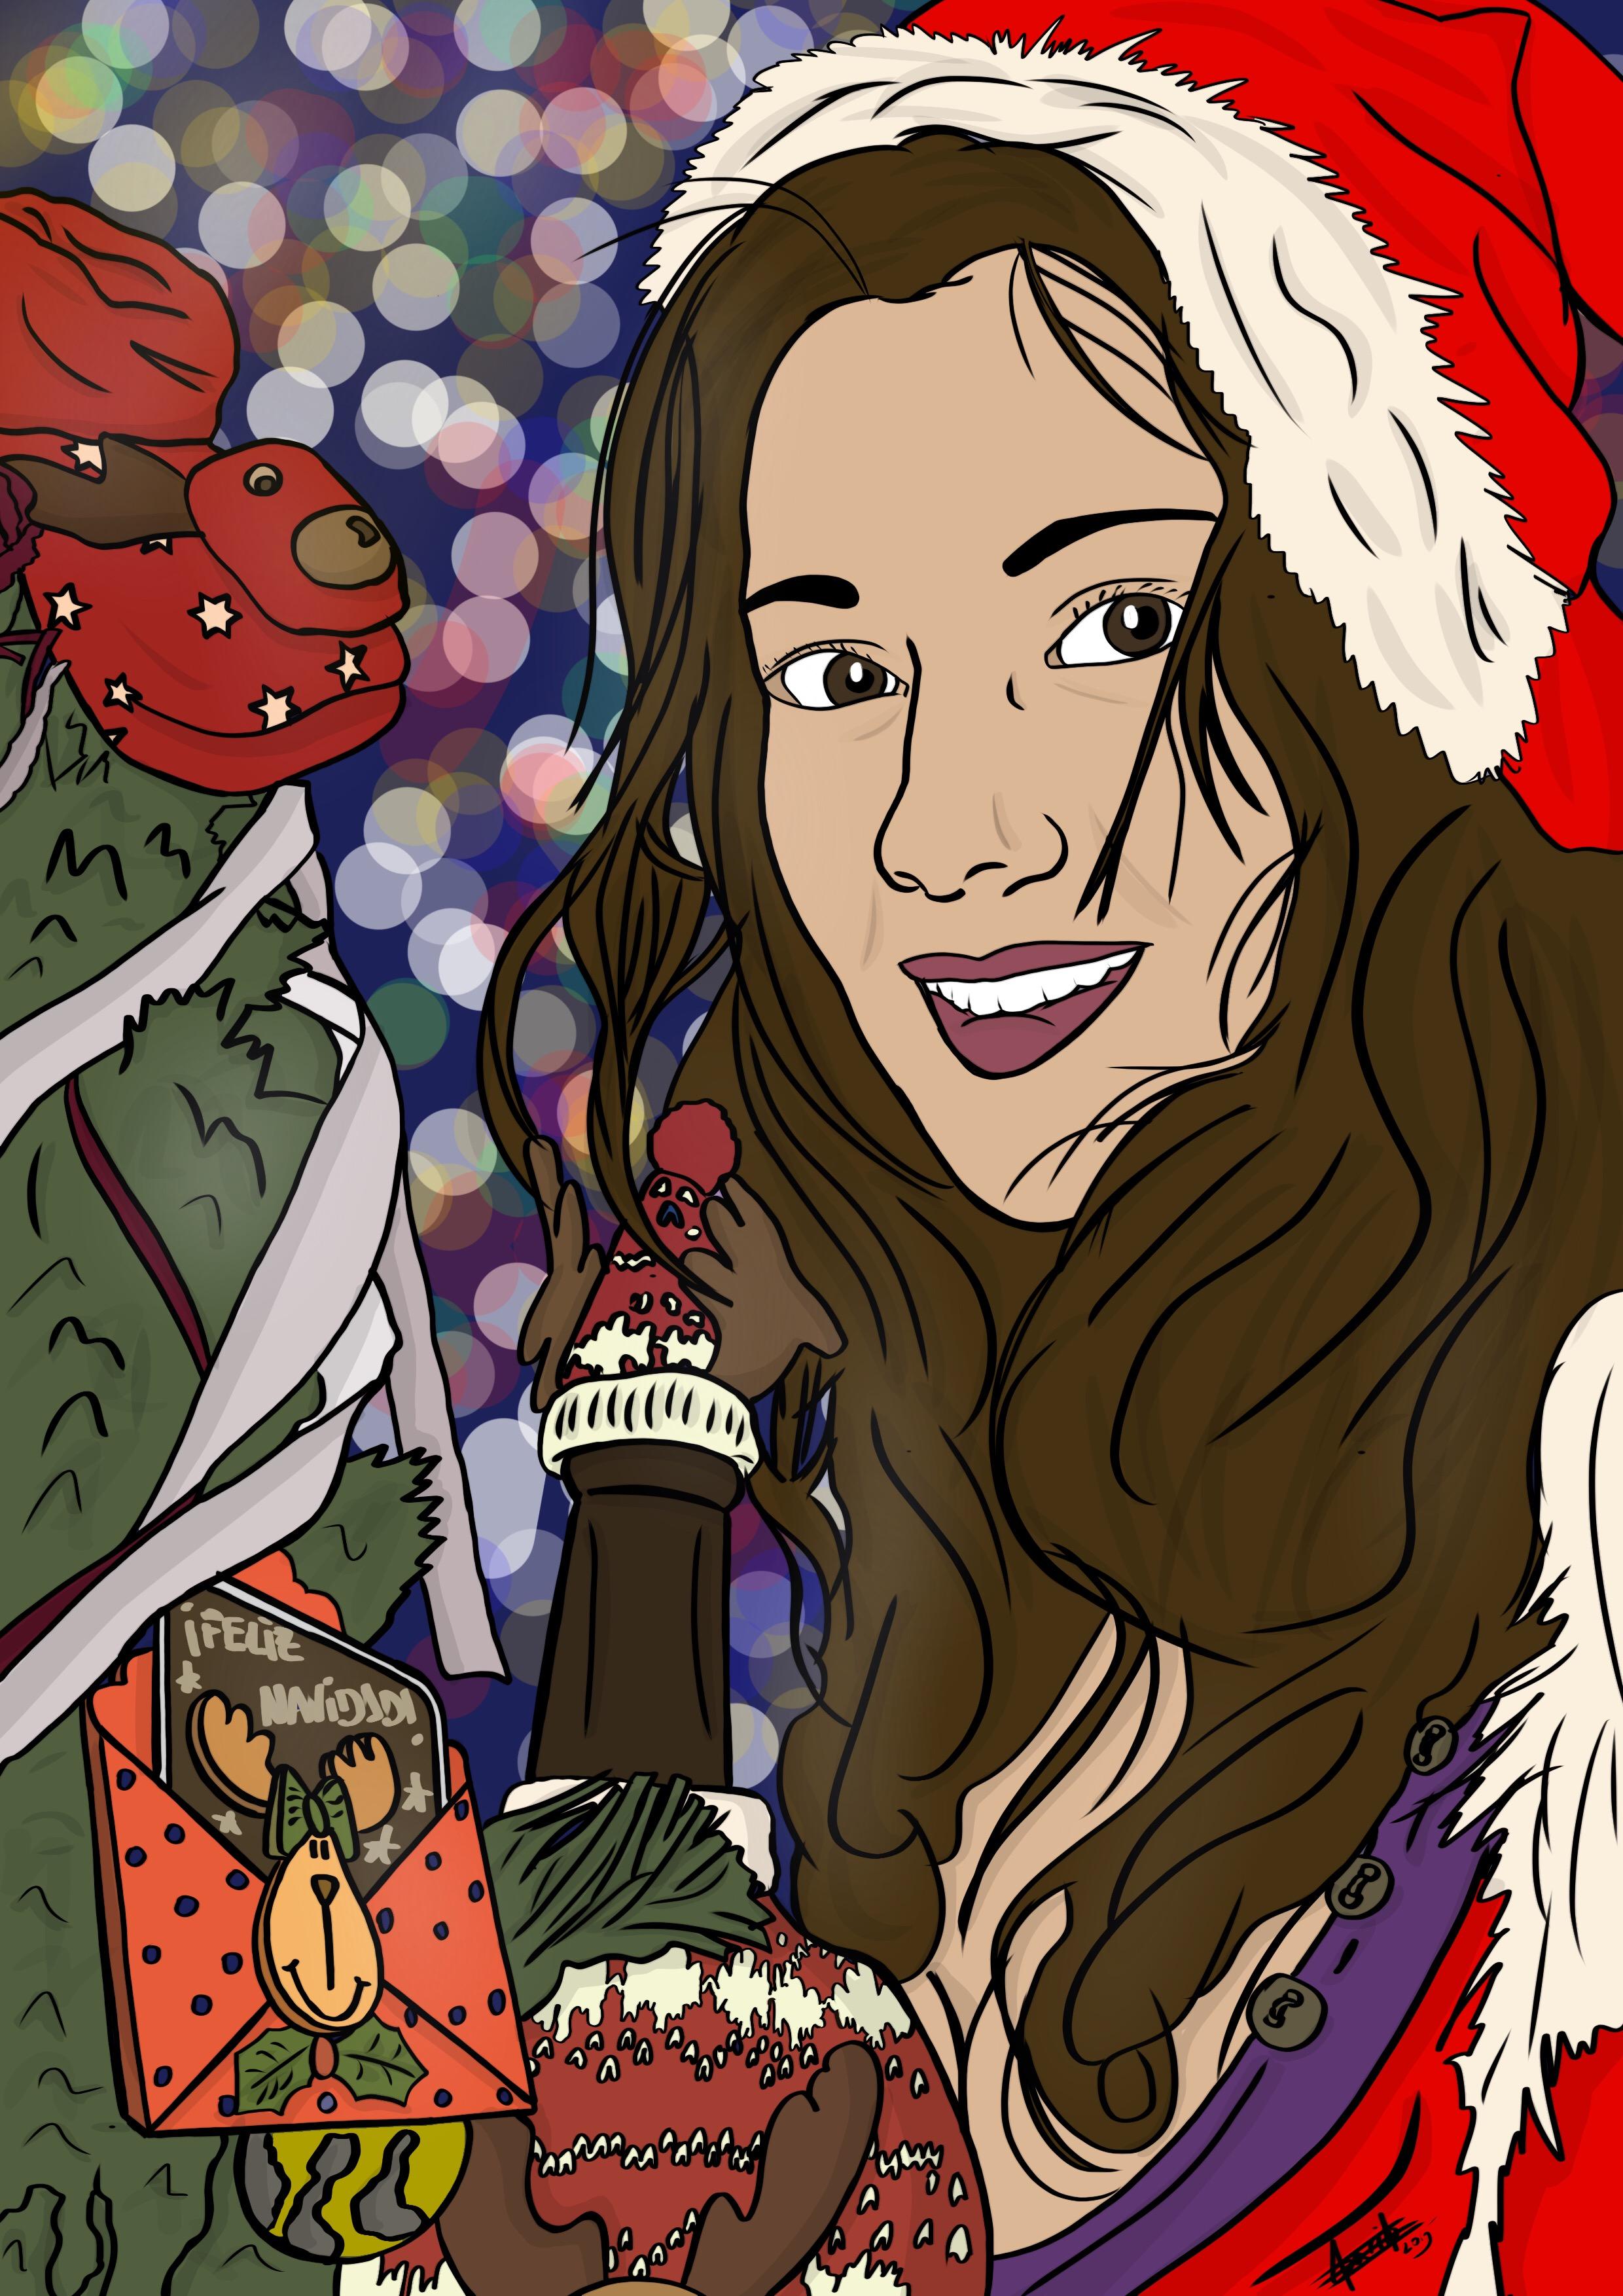 Retratos__David_Pallás_Gozalo_Vicky_Navidad